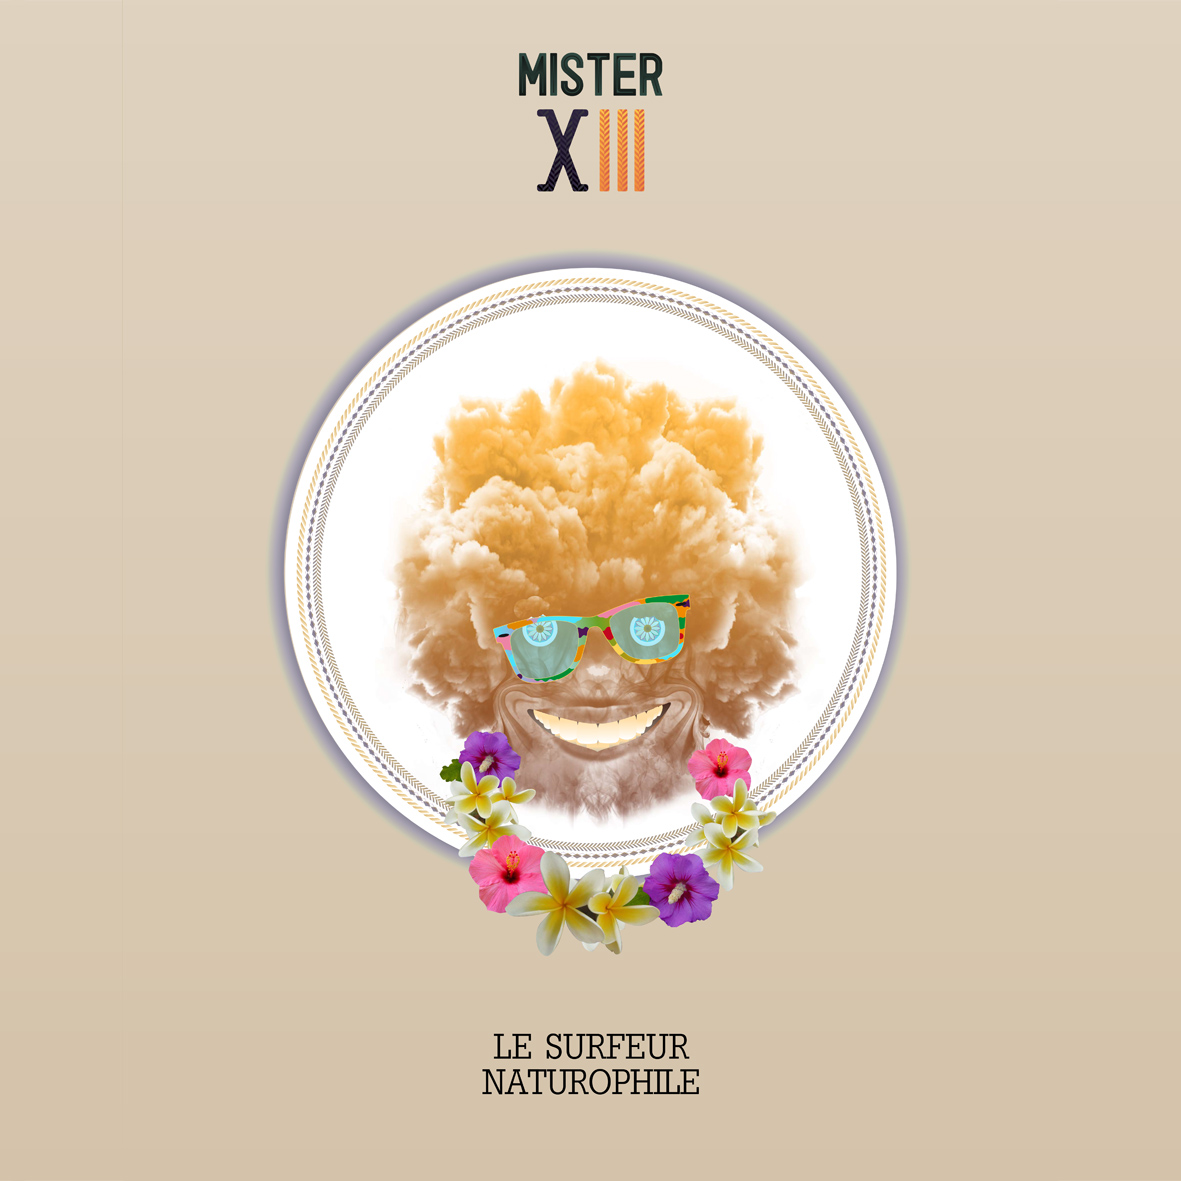 Mister X III